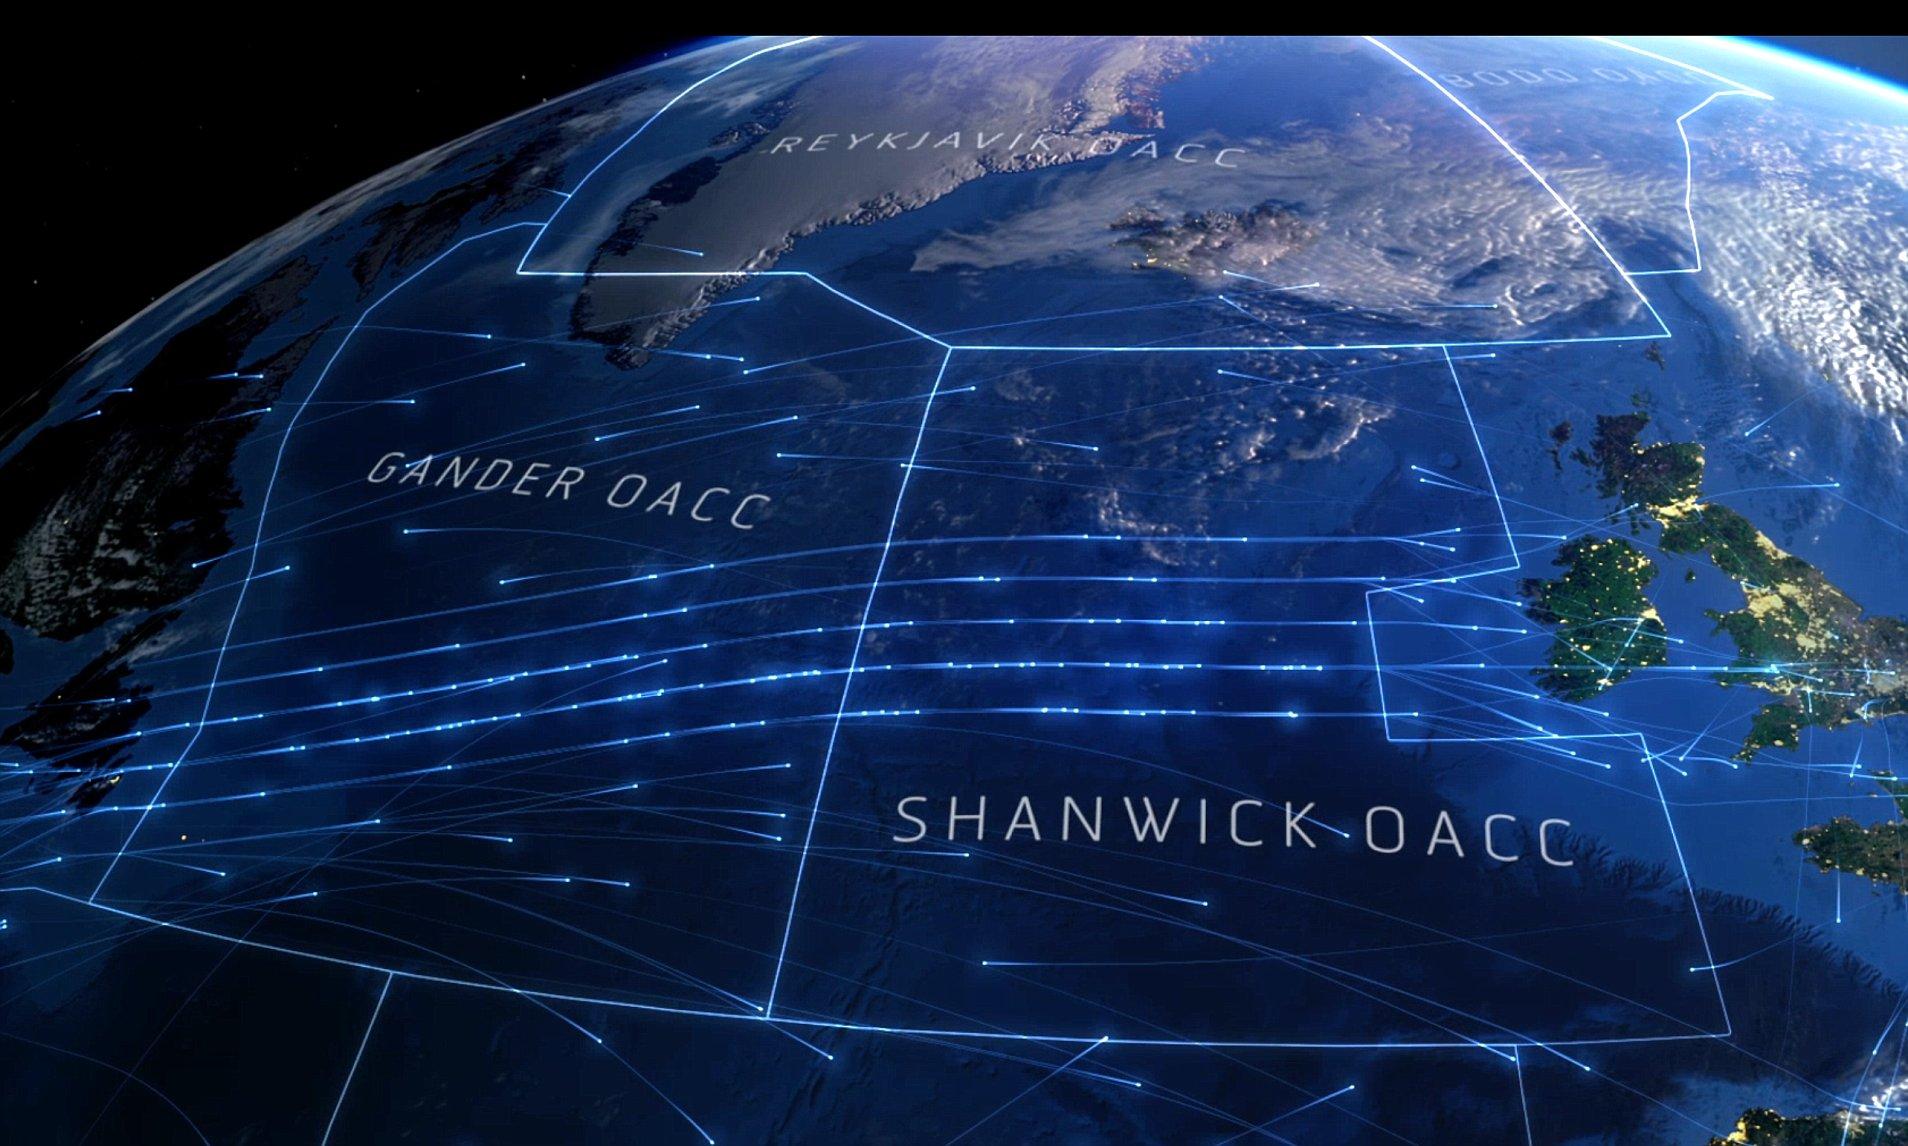 The North Atlantic Datalink Mandate – 2021 update